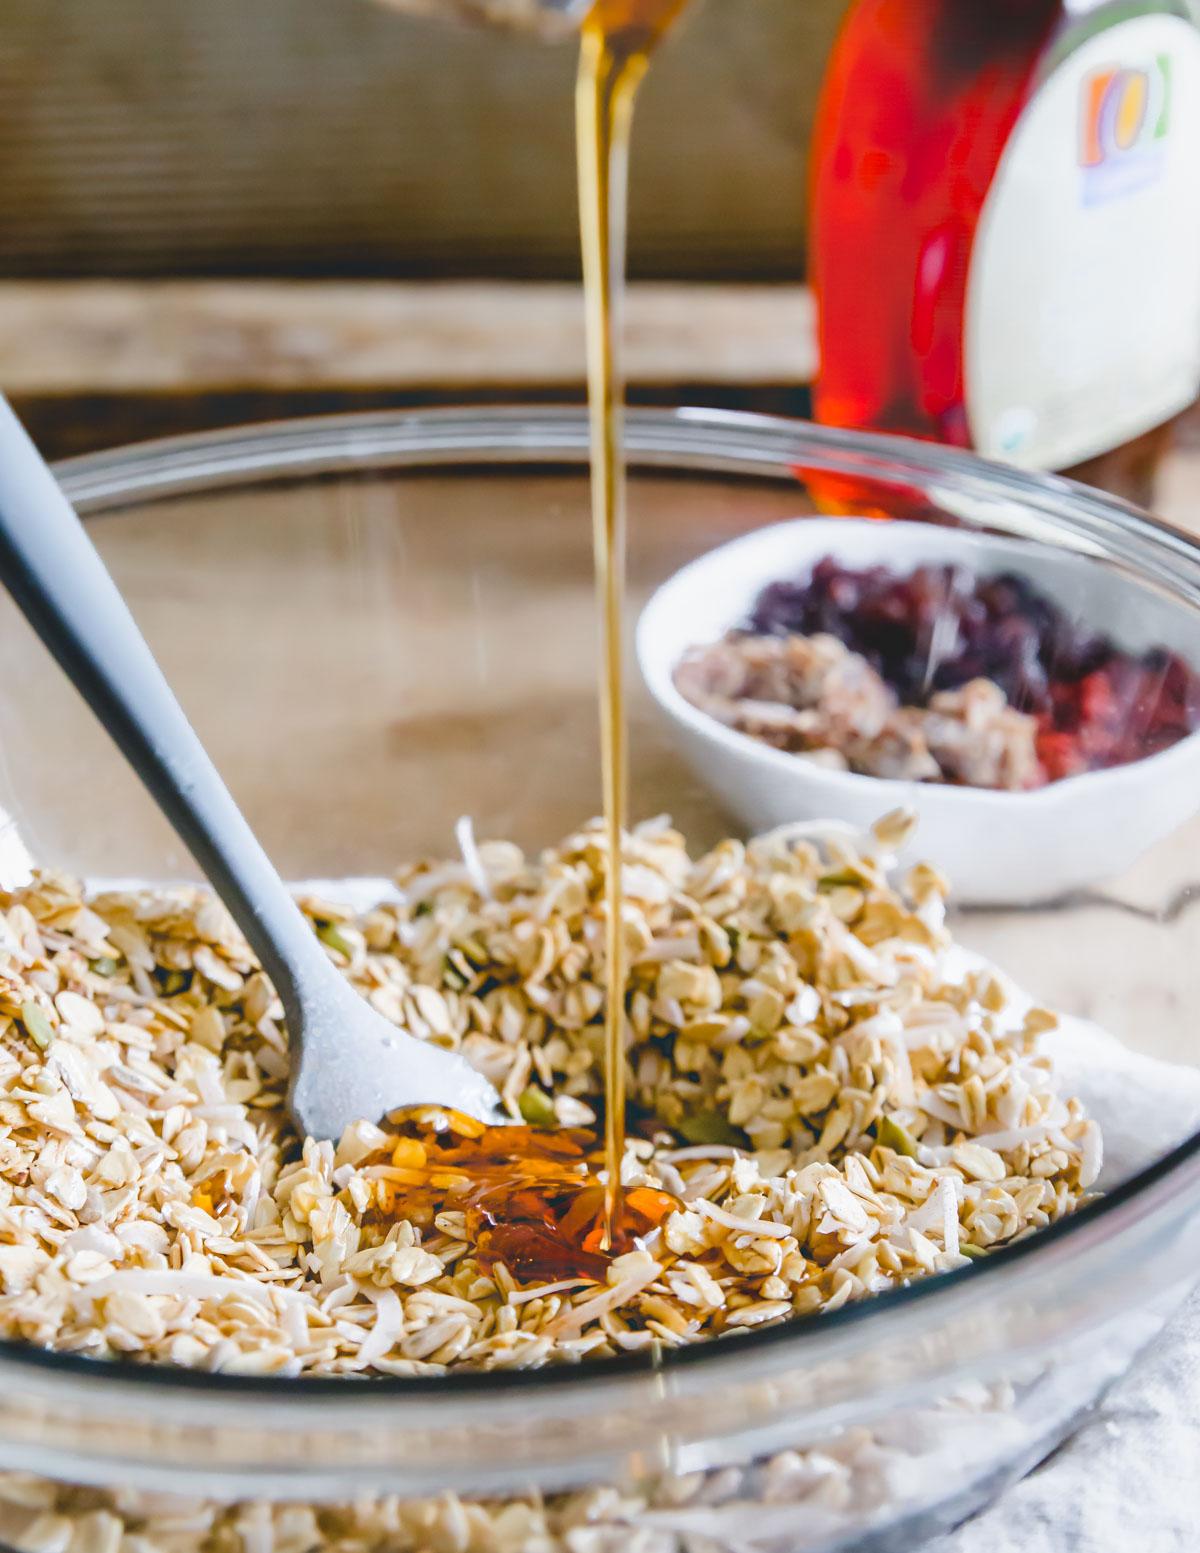 making nut free granola using gluten-free oats, coconut flakes, pepitas, sunflower seeds and buckwheat groats